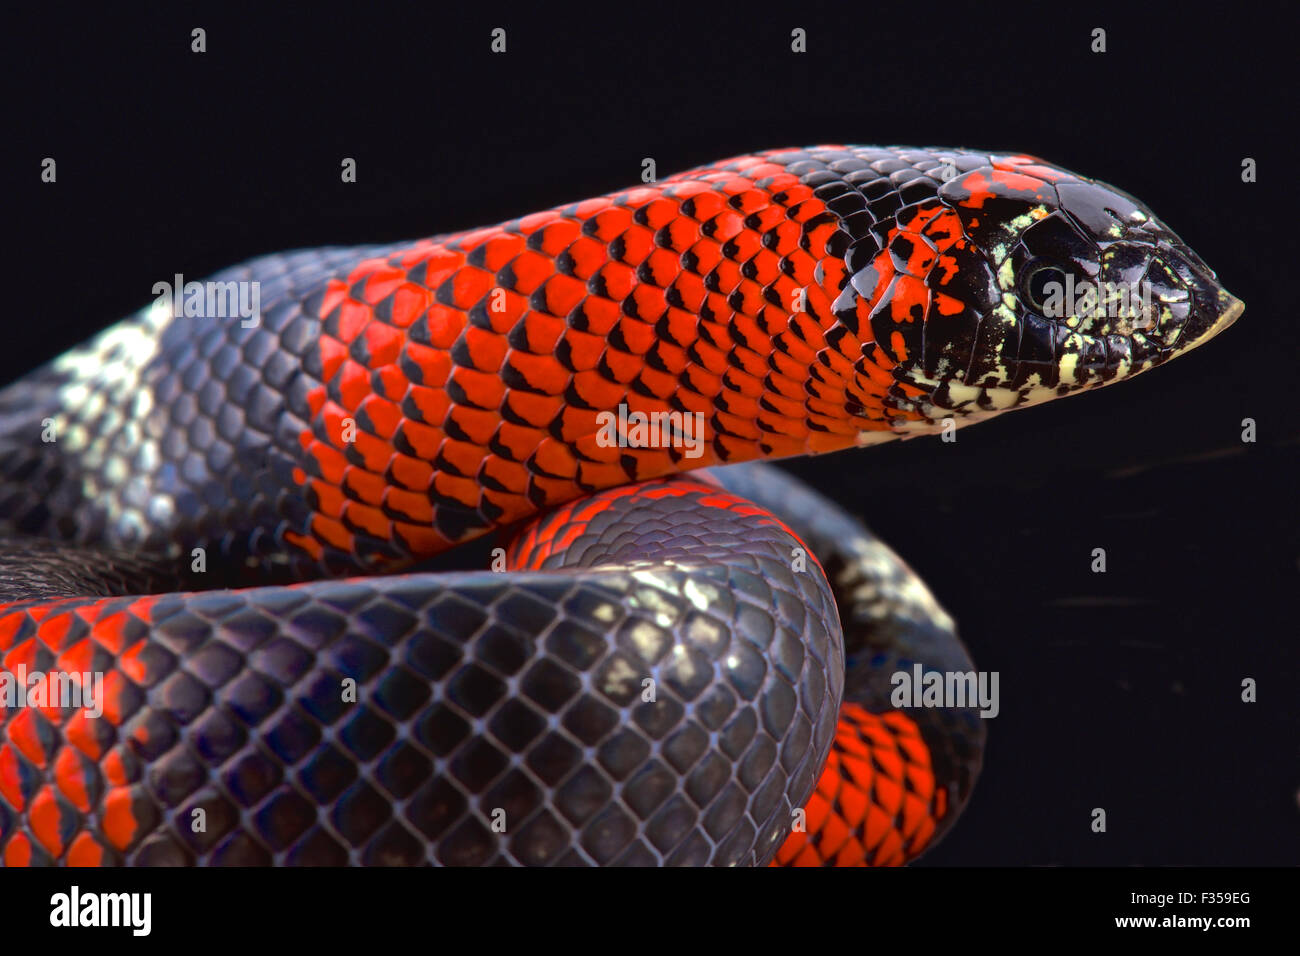 Tri-color hognose snake (Lystrophis pulcher) - Stock Image